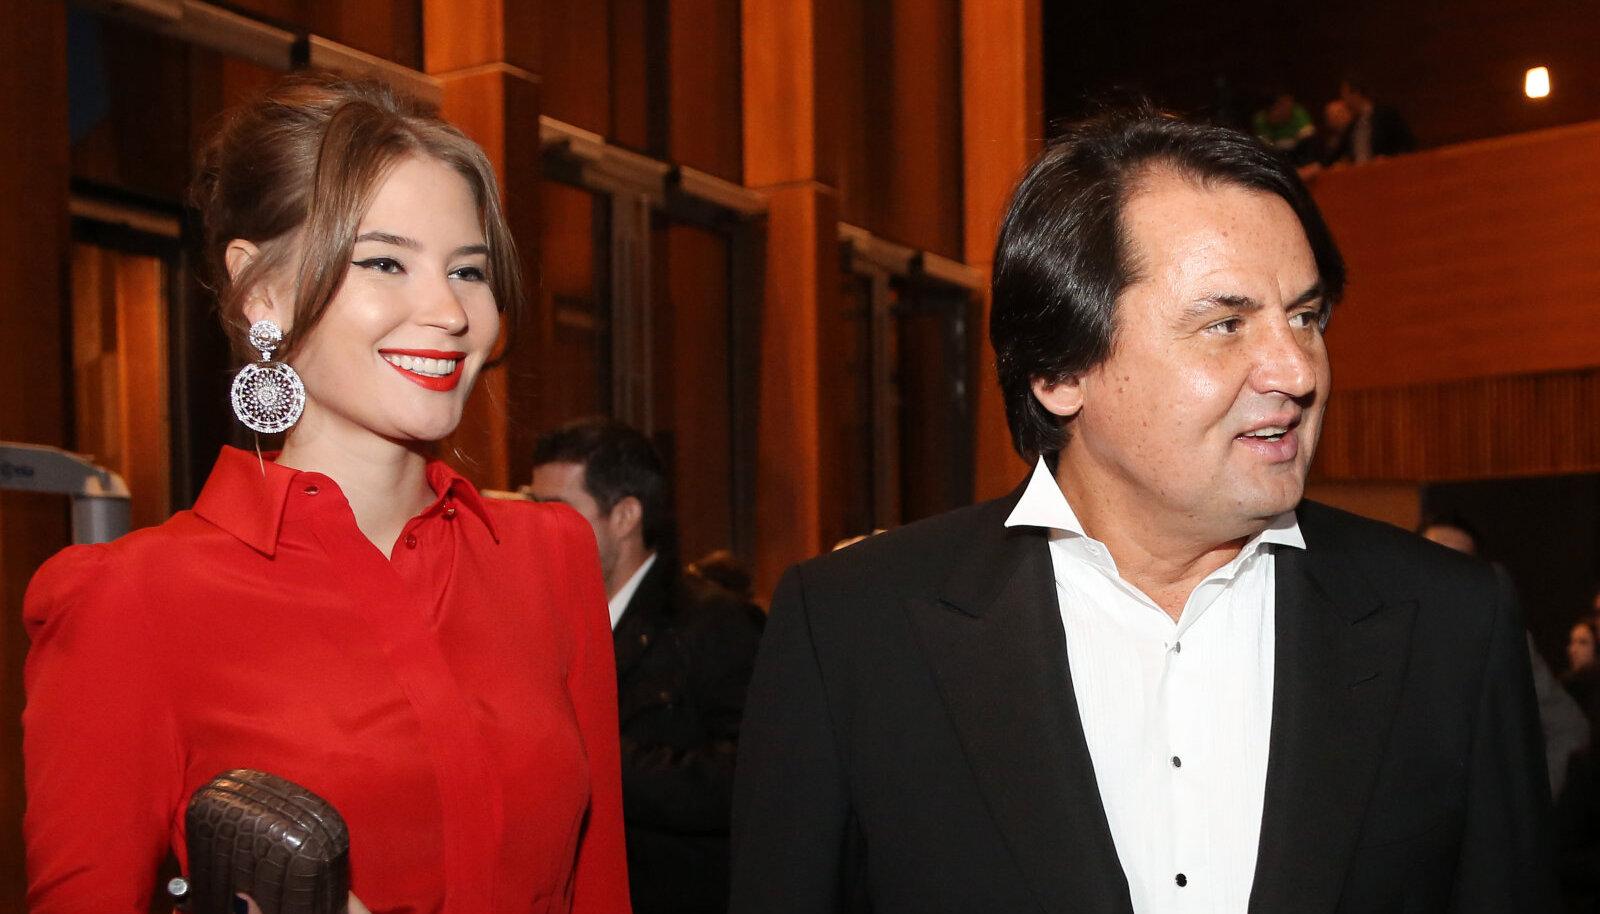 Roustam Tariko koos abikaasa Jelenaga.